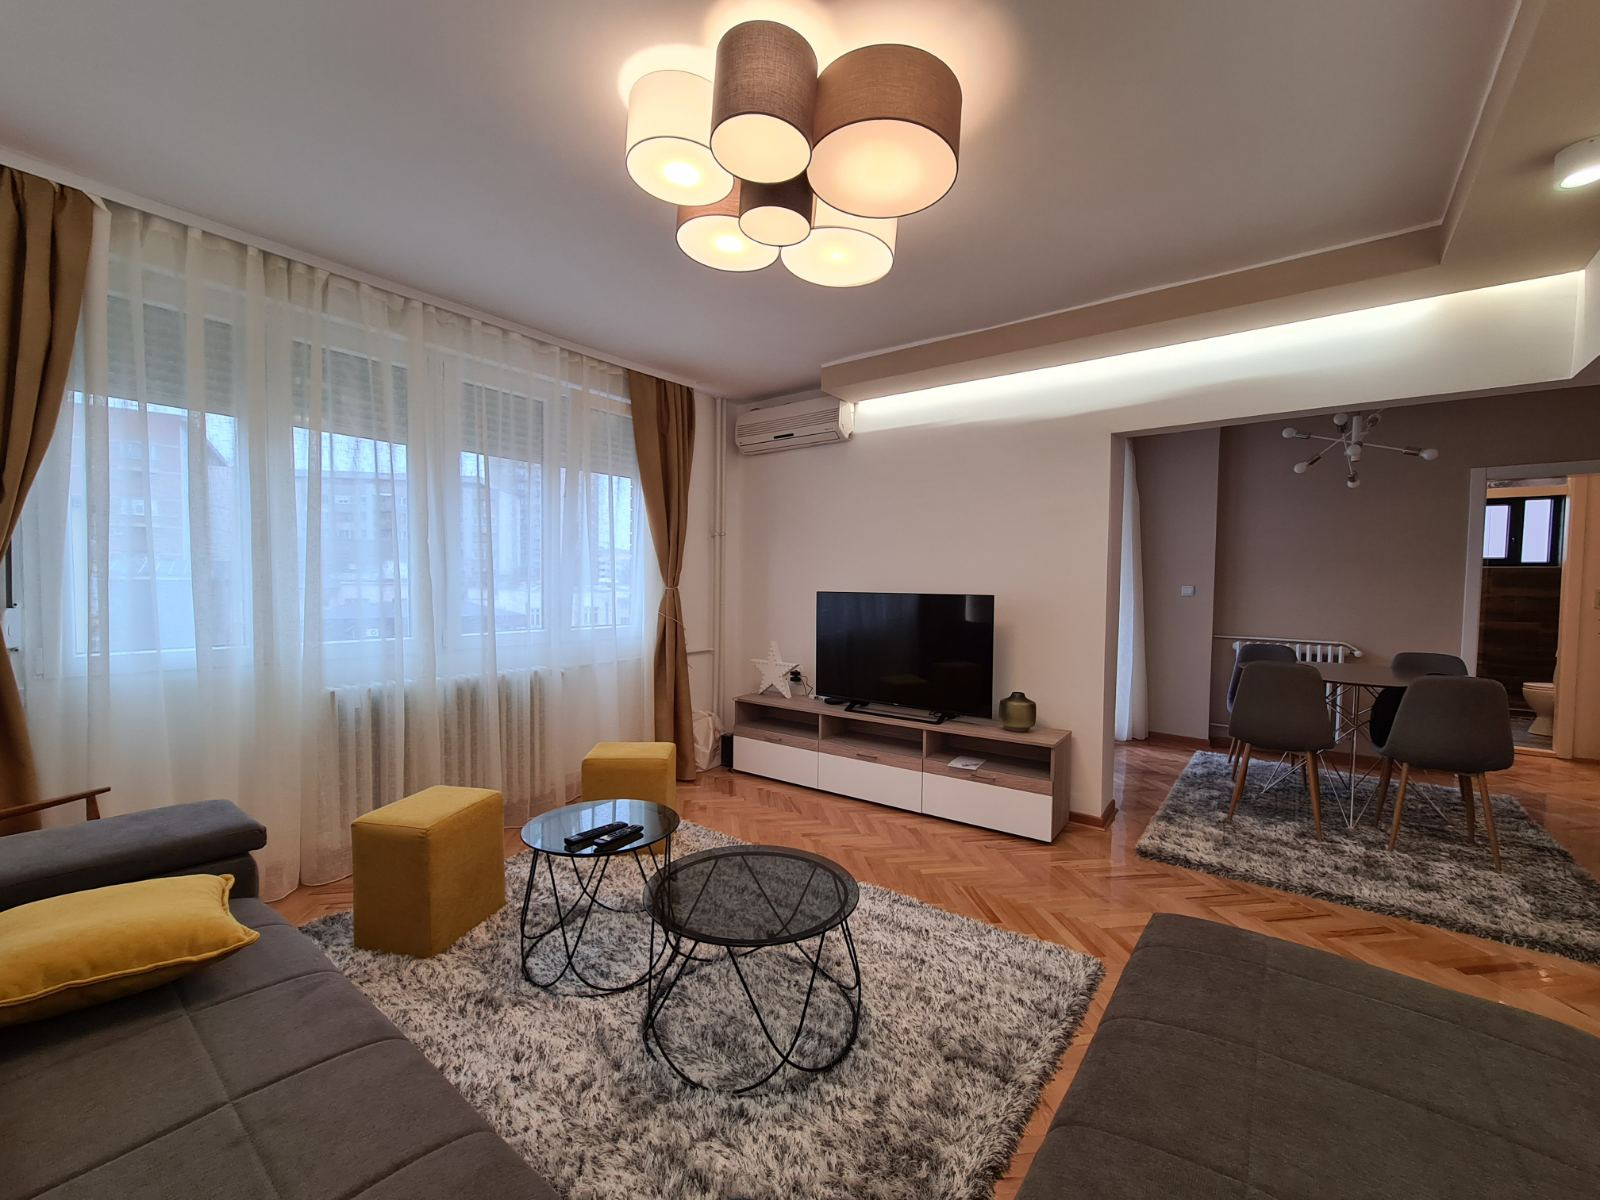 Trosoban nov stan u samom centru grada